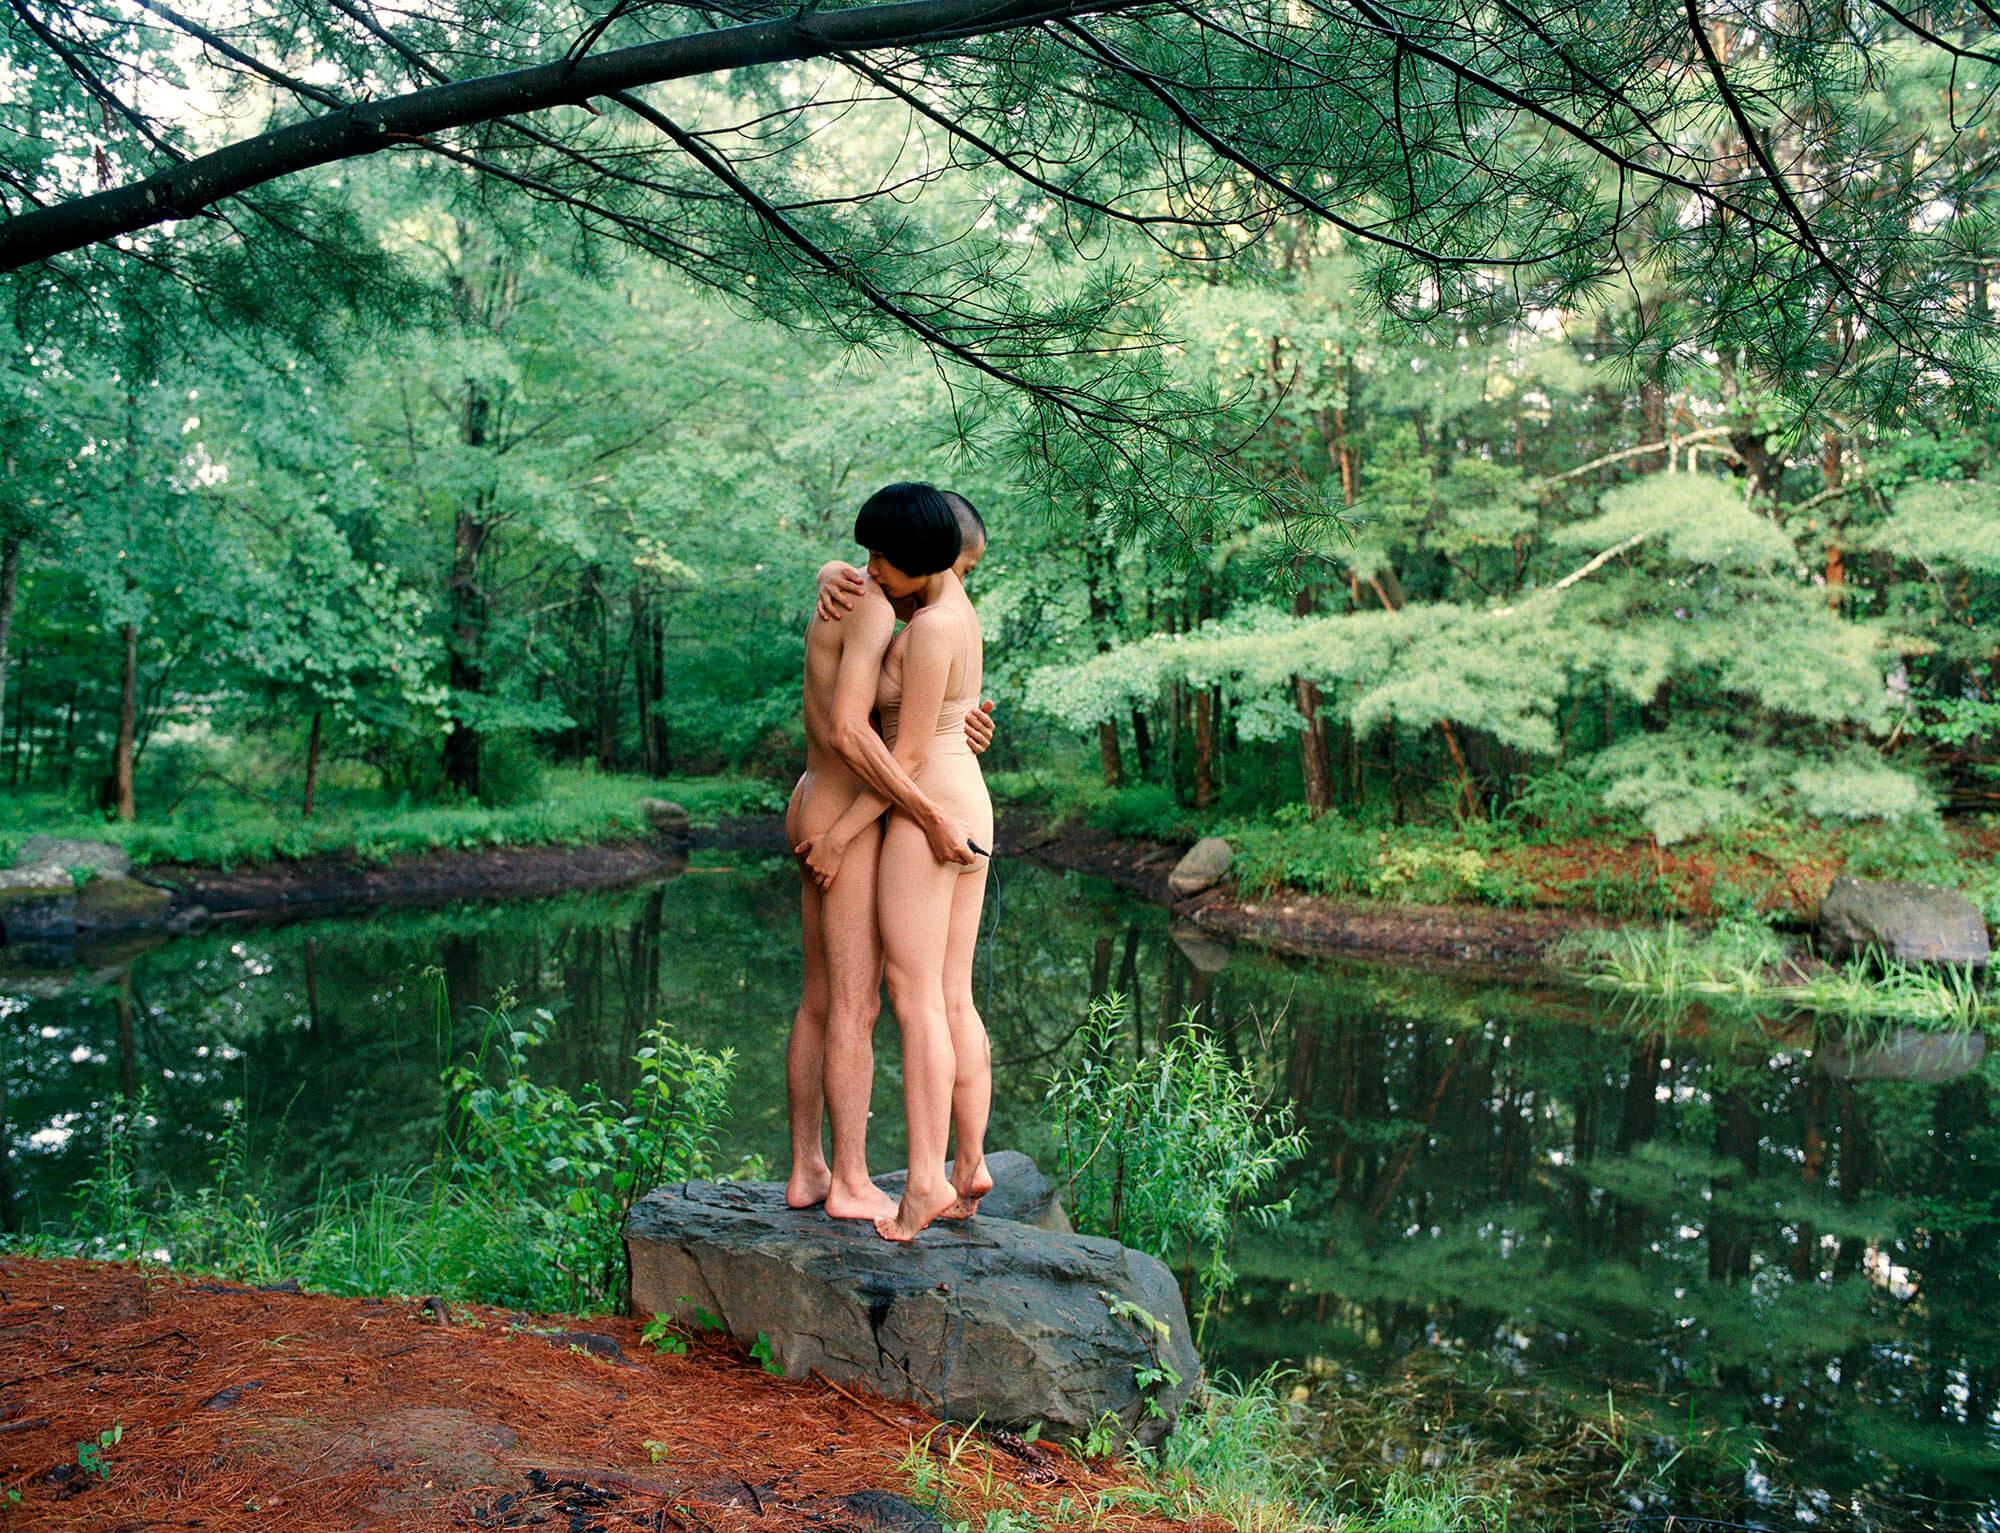 liao_2010_the-Hug-by-the-Pond-115×150-1